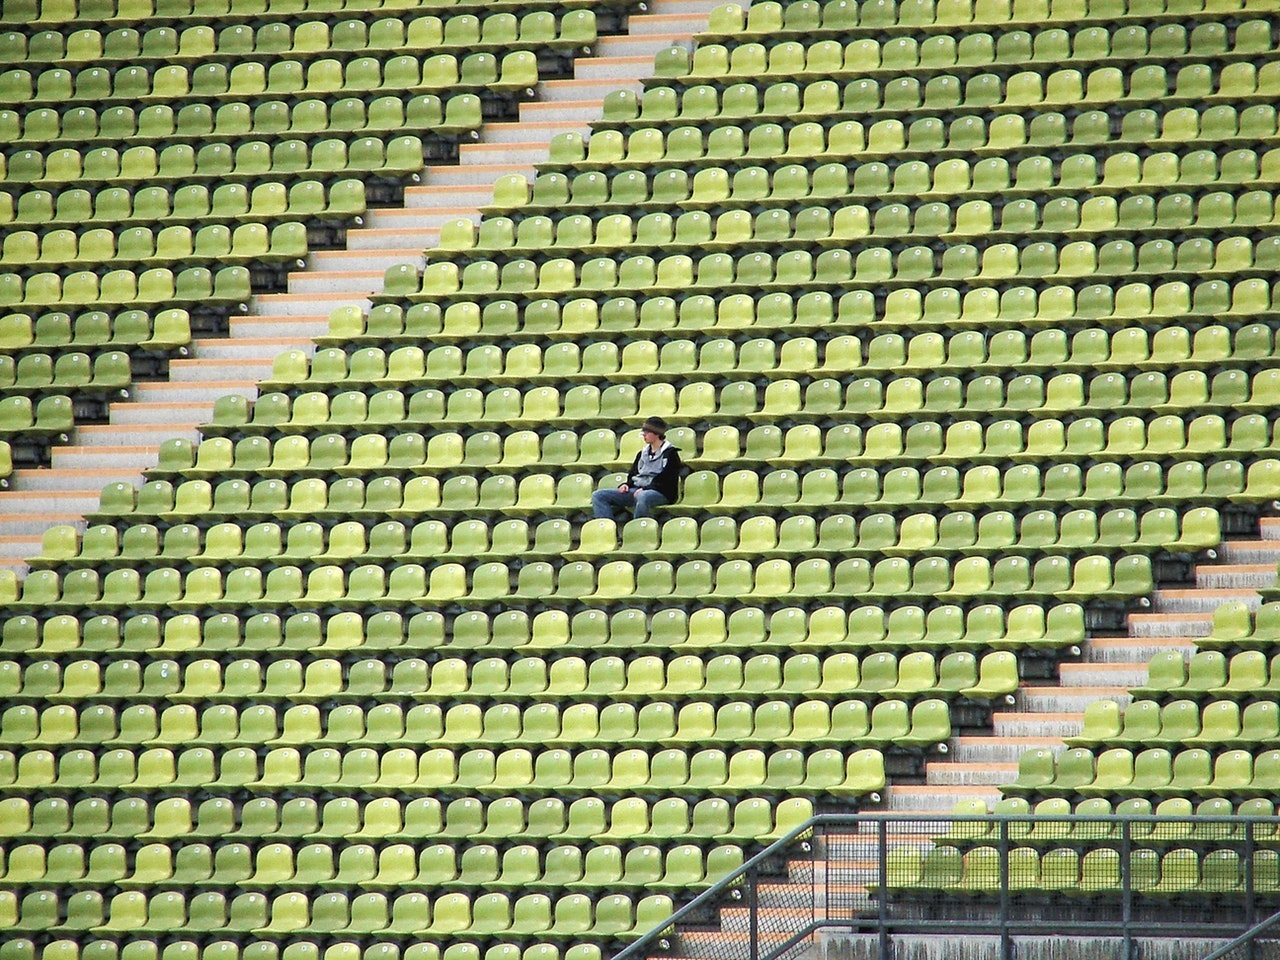 lonely person sitting stadium alone.jpg